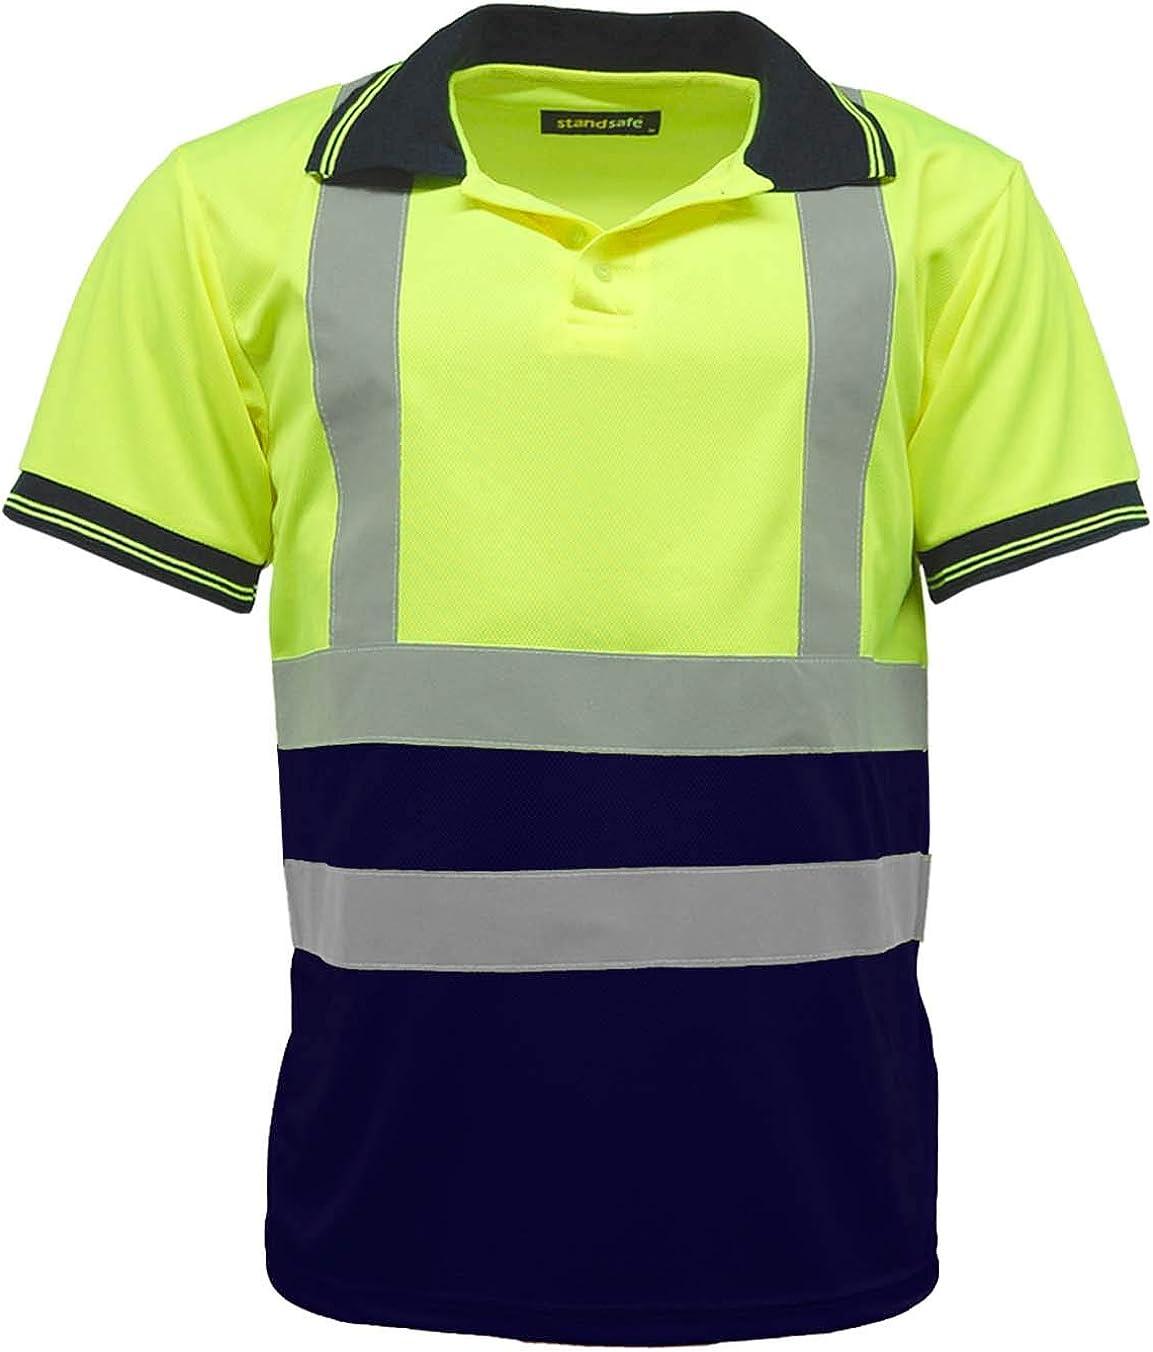 HV004 High Vis Visibility Short Sleeve Polo T Shirt EN471